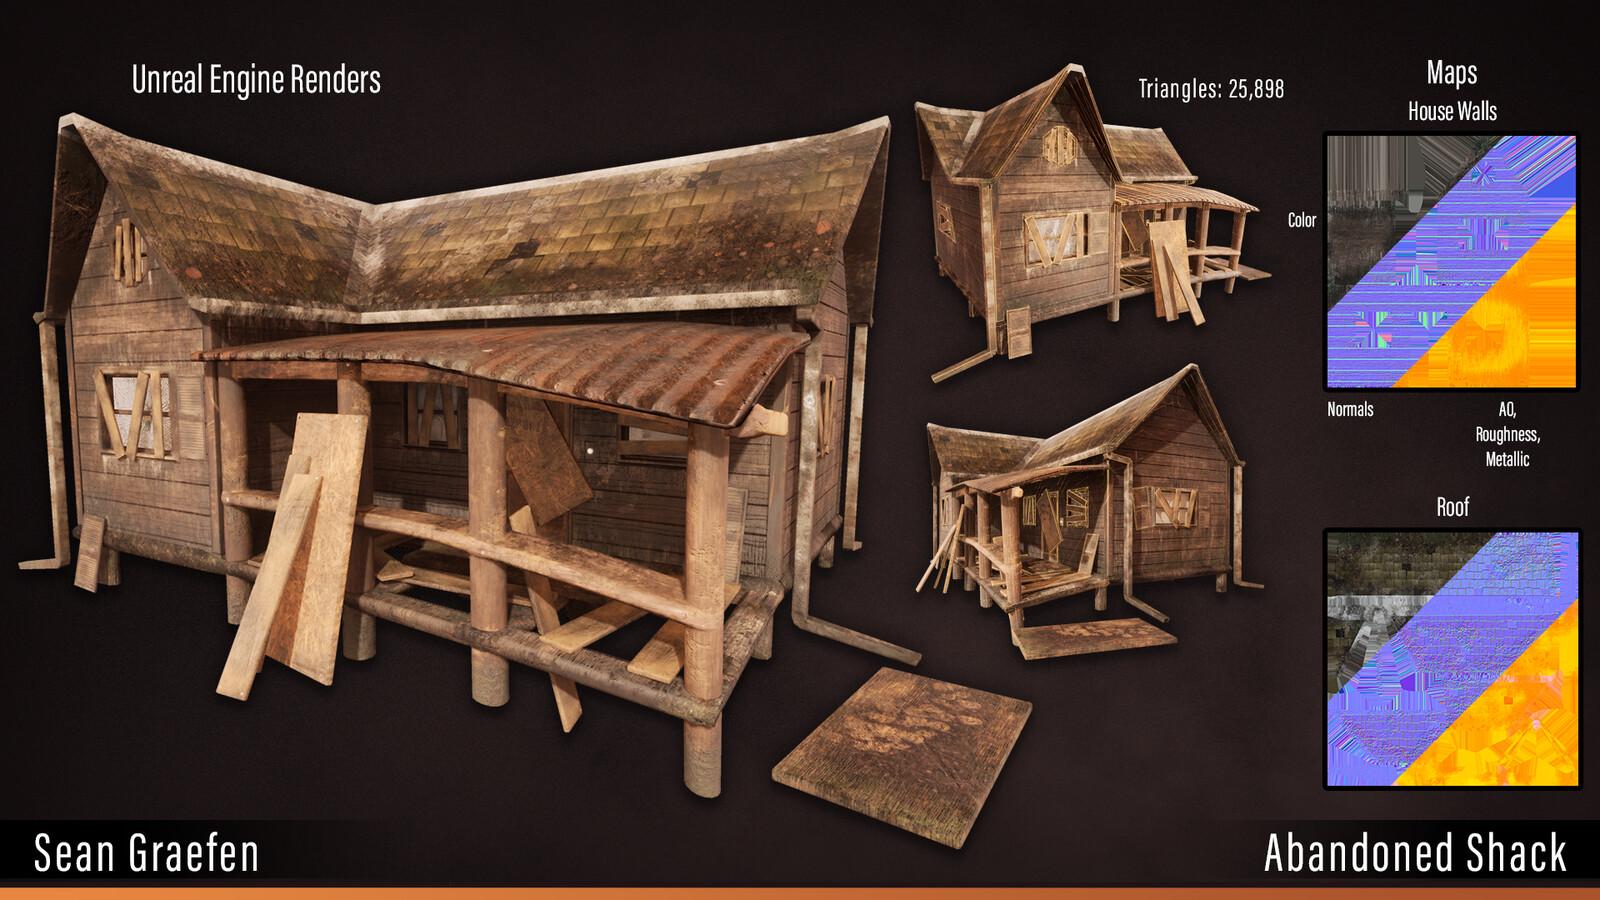 Abandoned shack model sheet.